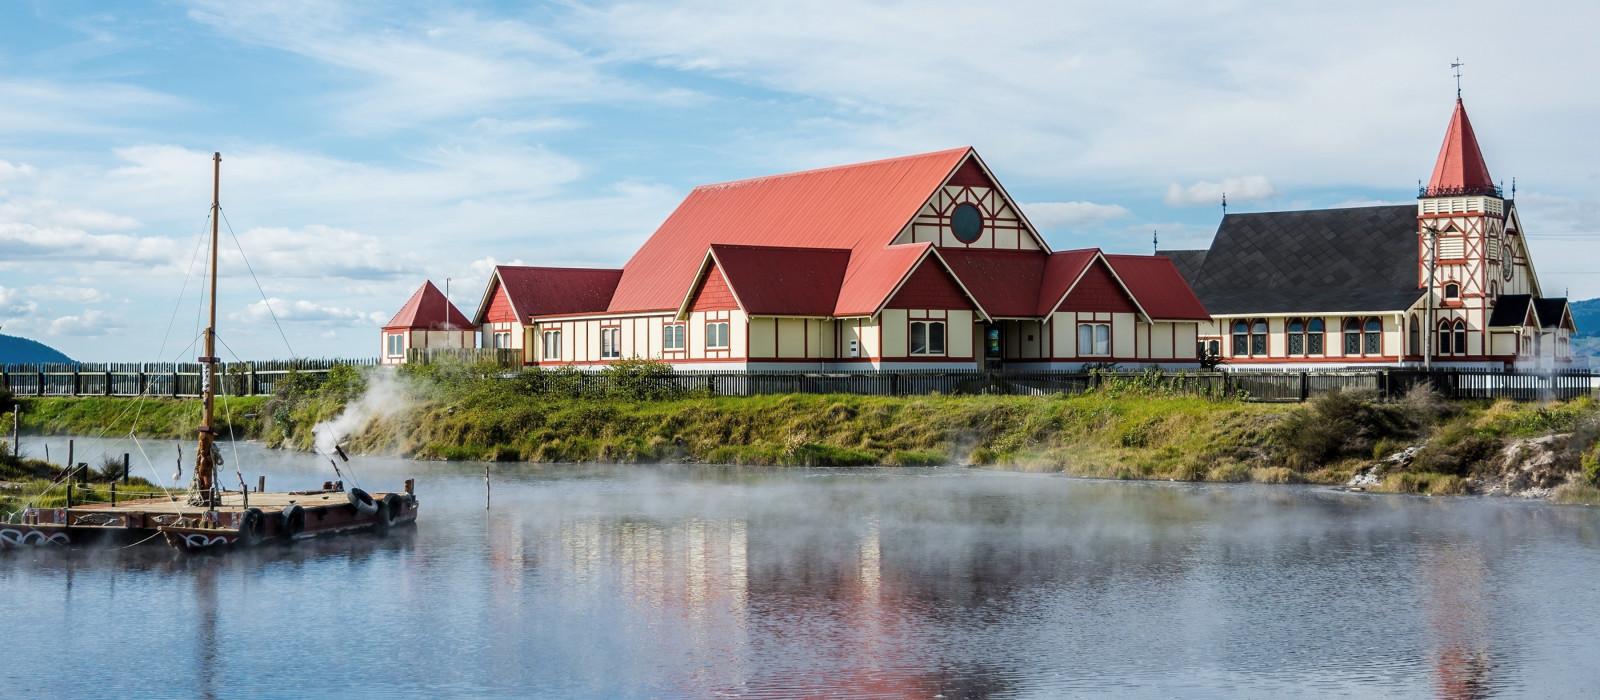 a maori village in new zealand